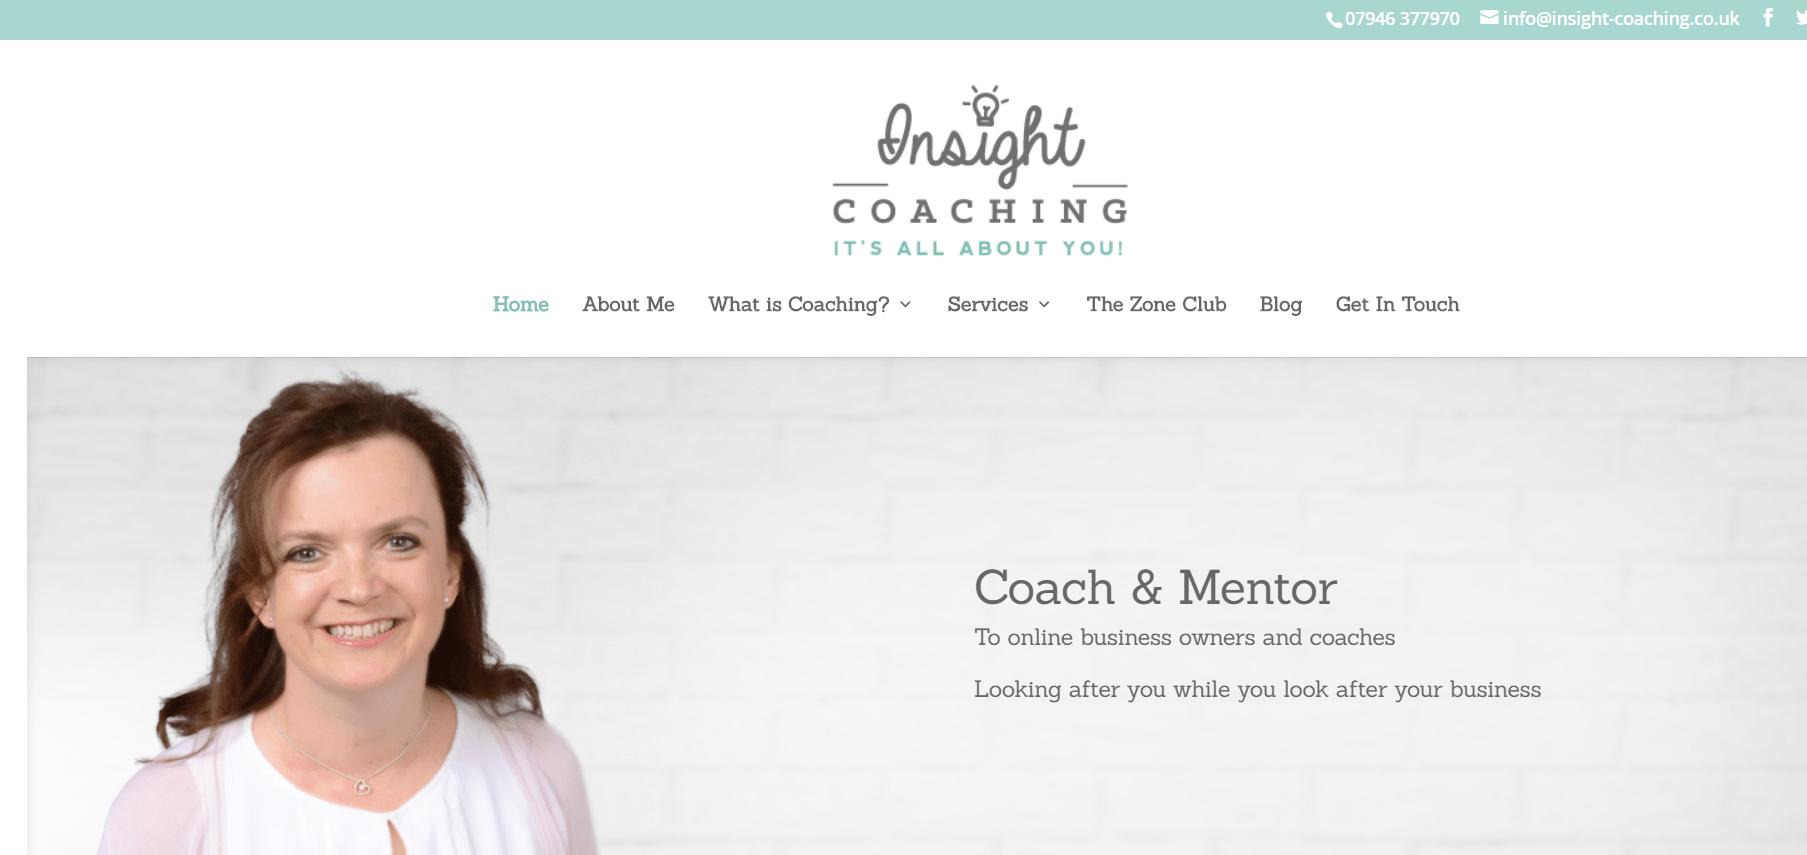 photos in coaching website